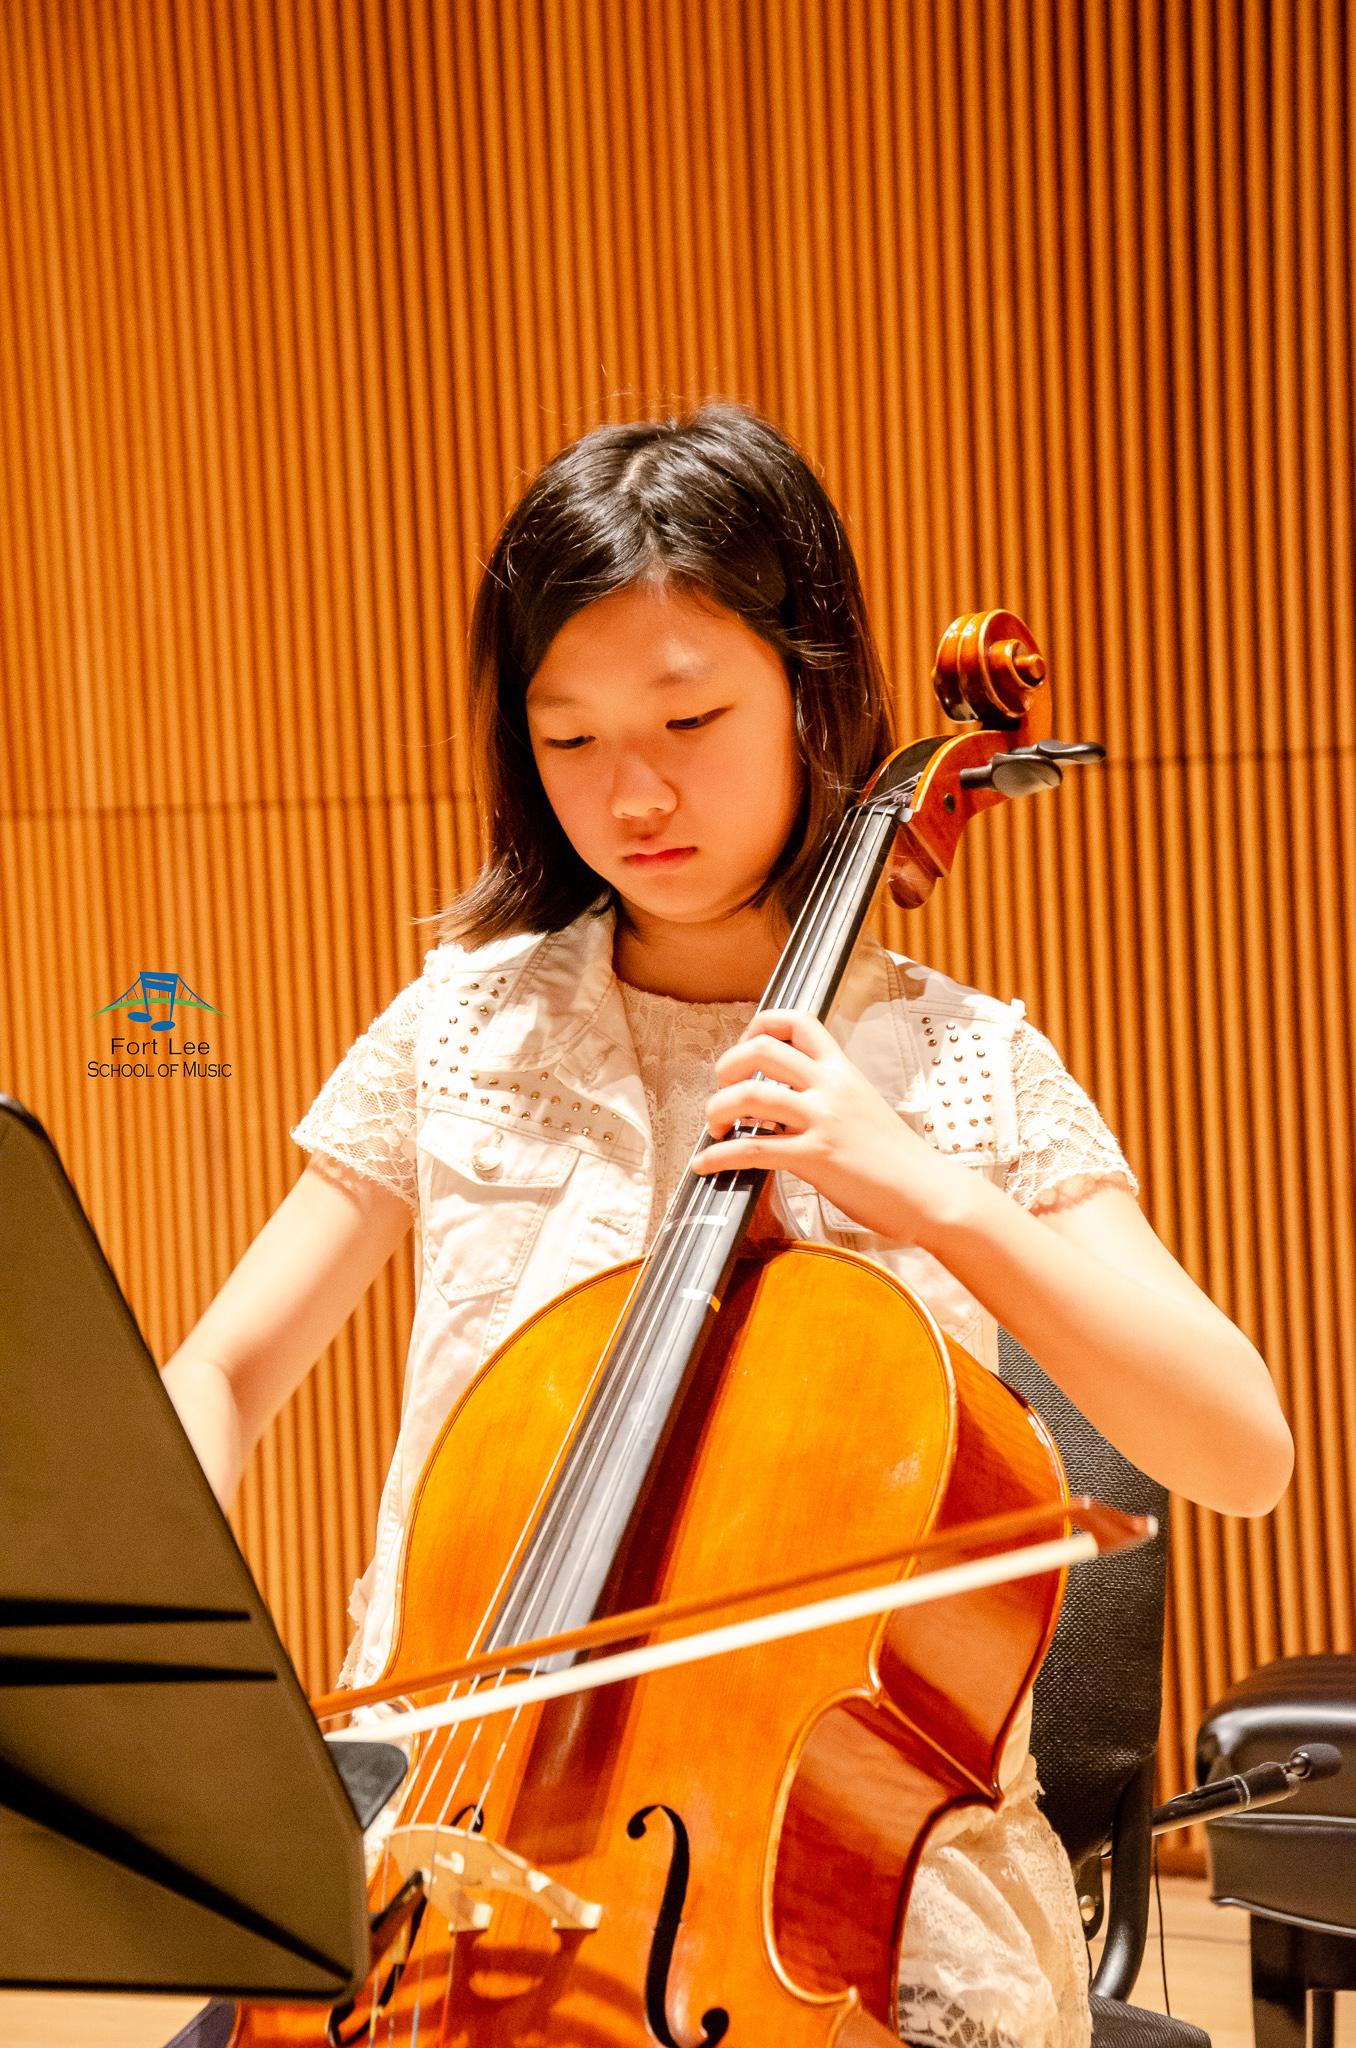 cello-lessons-fort-lee.jpg